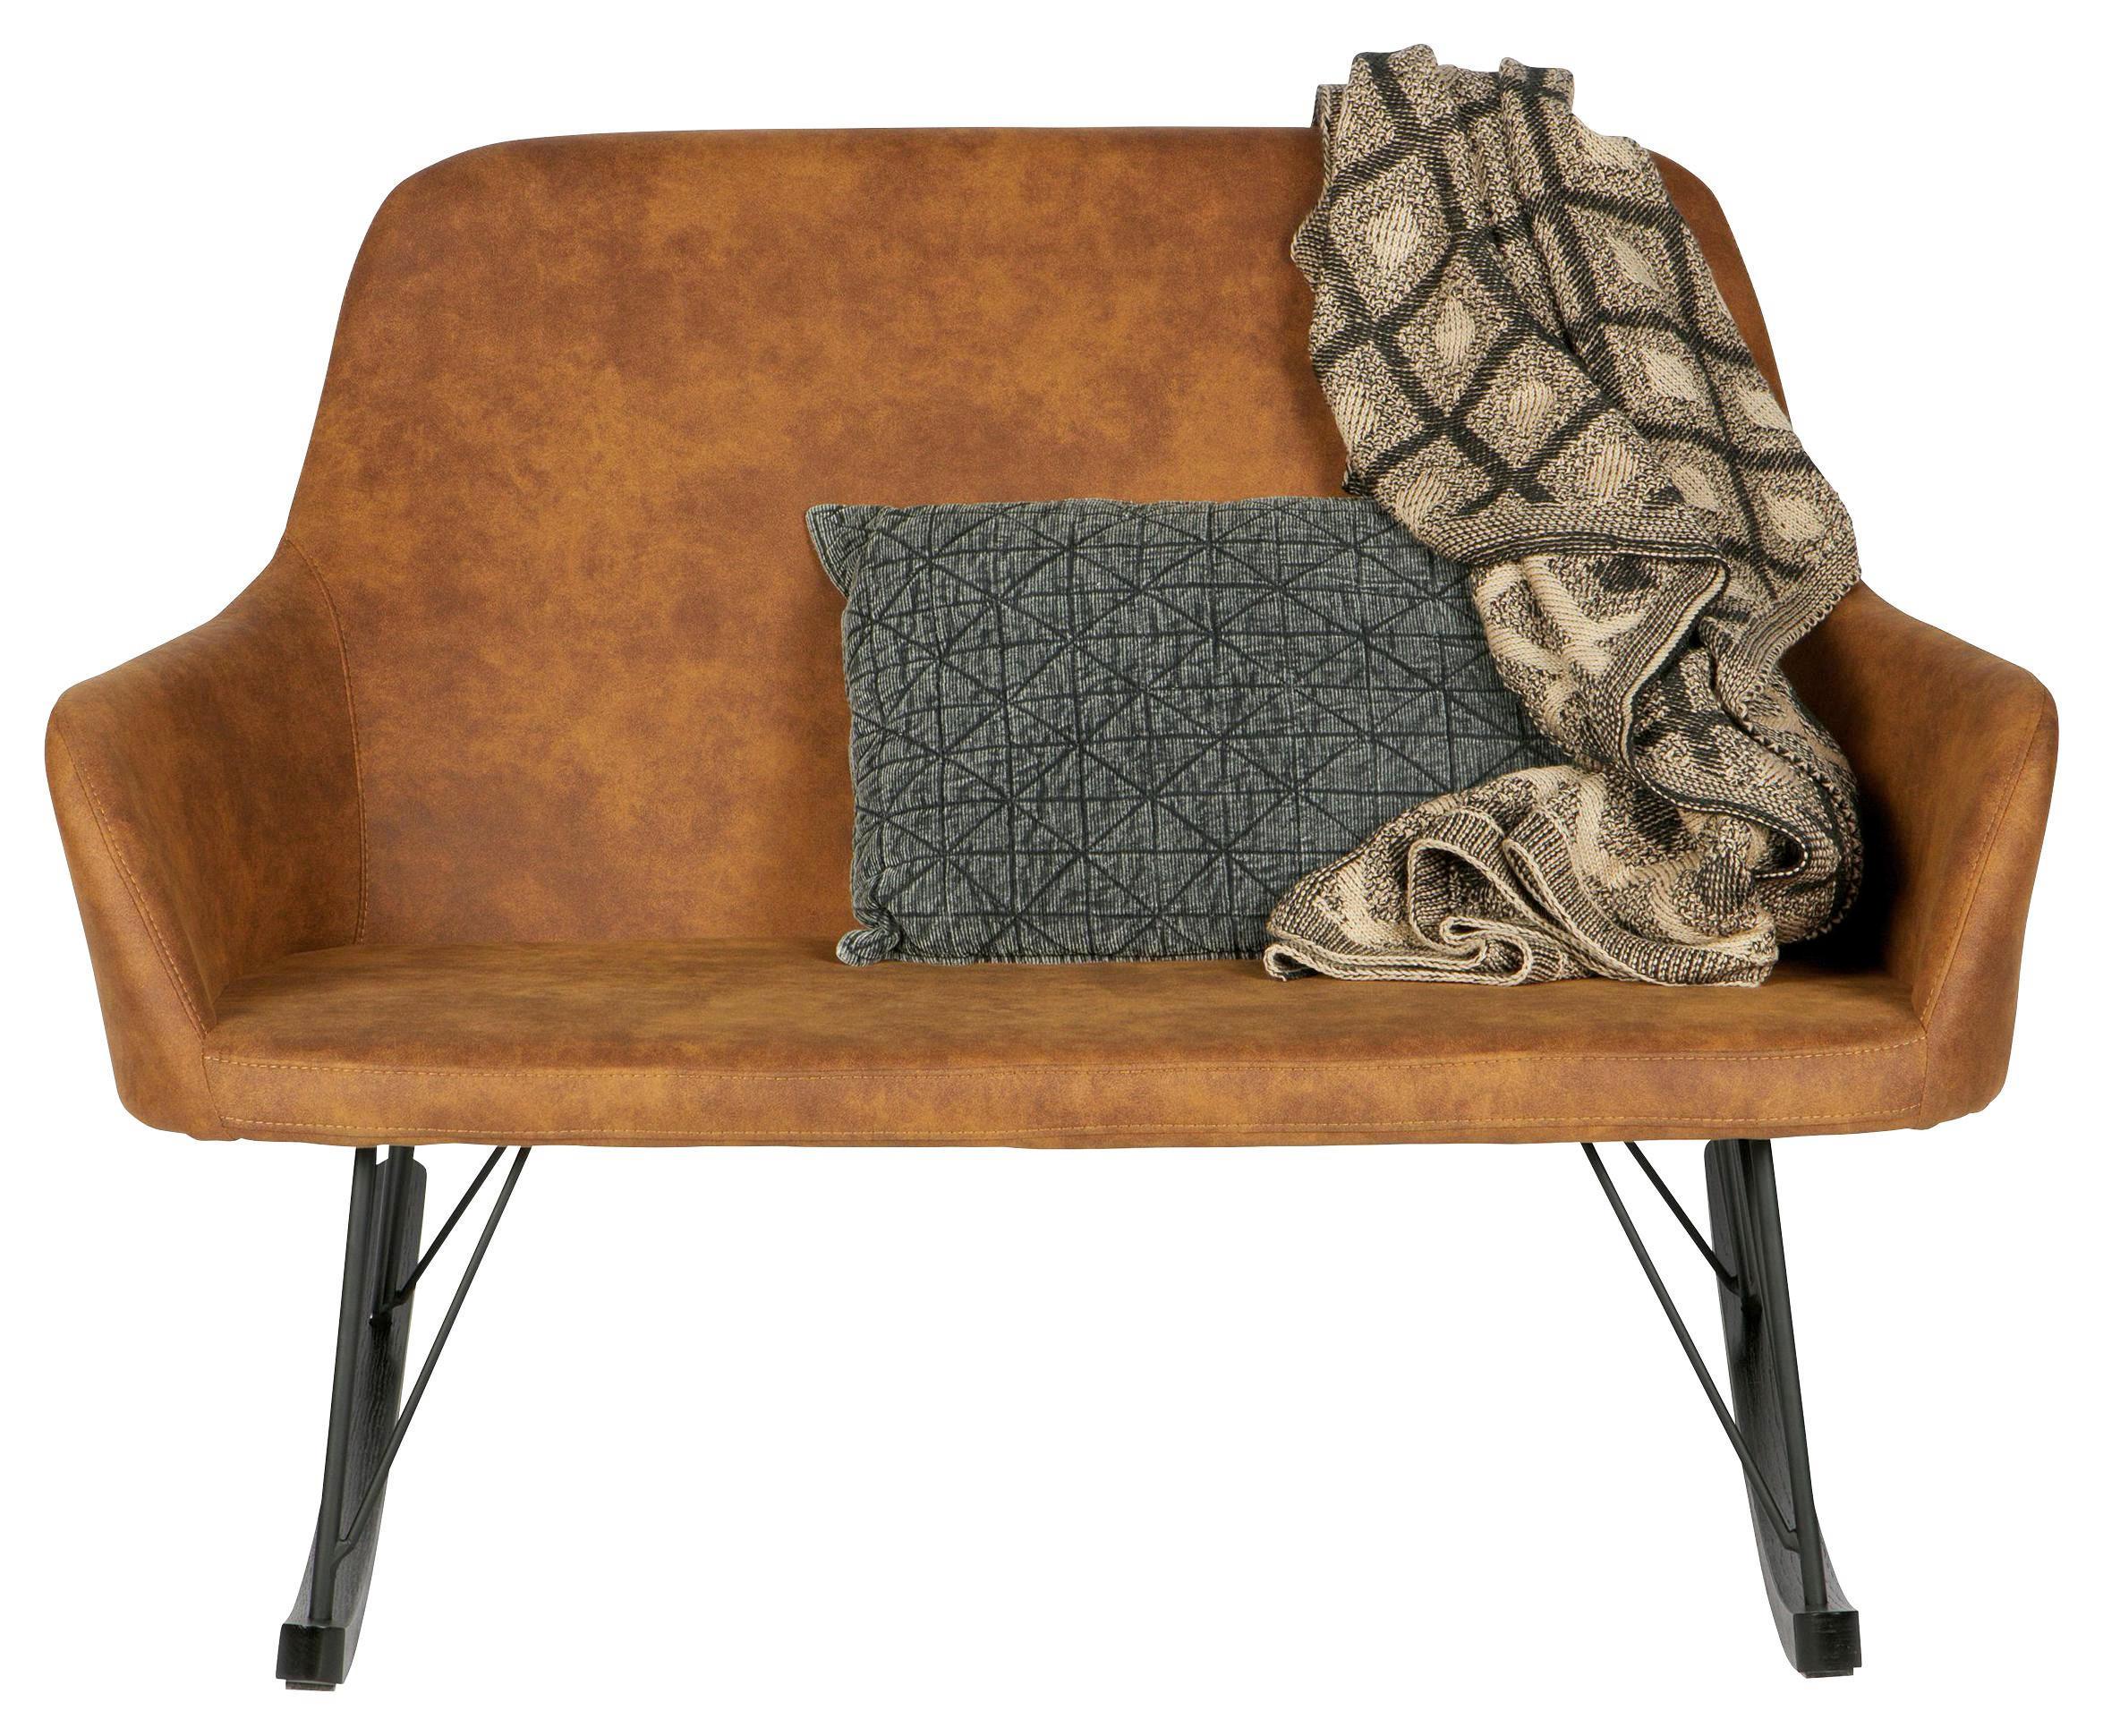 SOFA in Braun Textil - Braun, Design, Holz/Textil (126/89/98cm) - Ambia Home